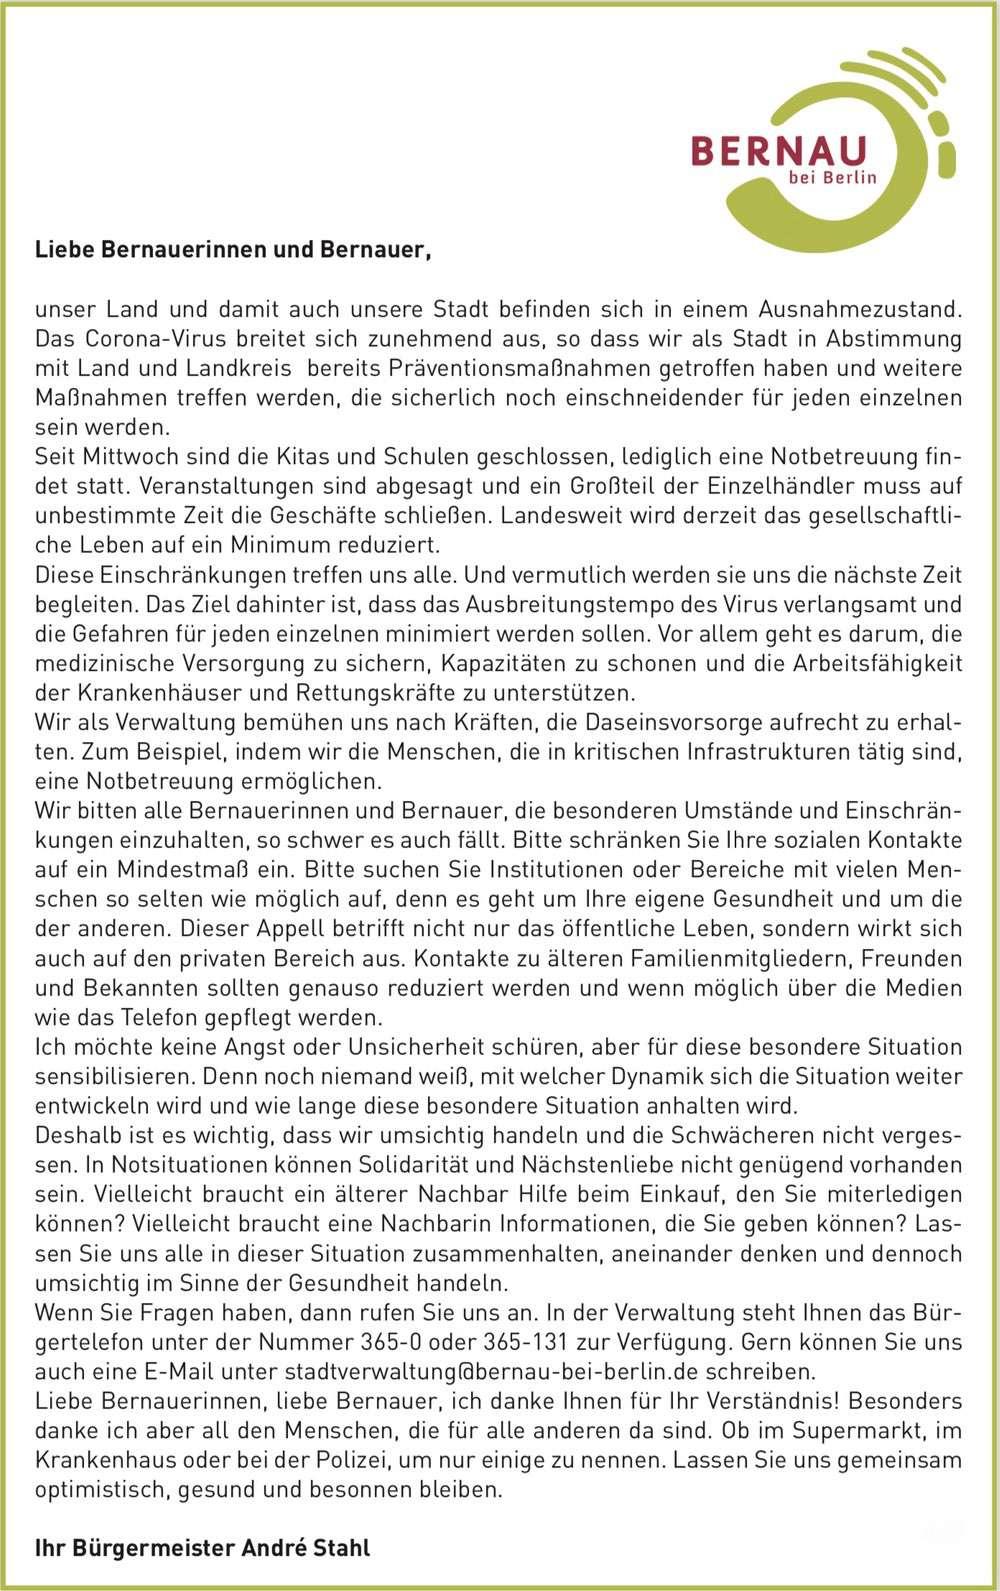 Corona-Statement Bürgermeister André Stahl - Bernau bei Berlin